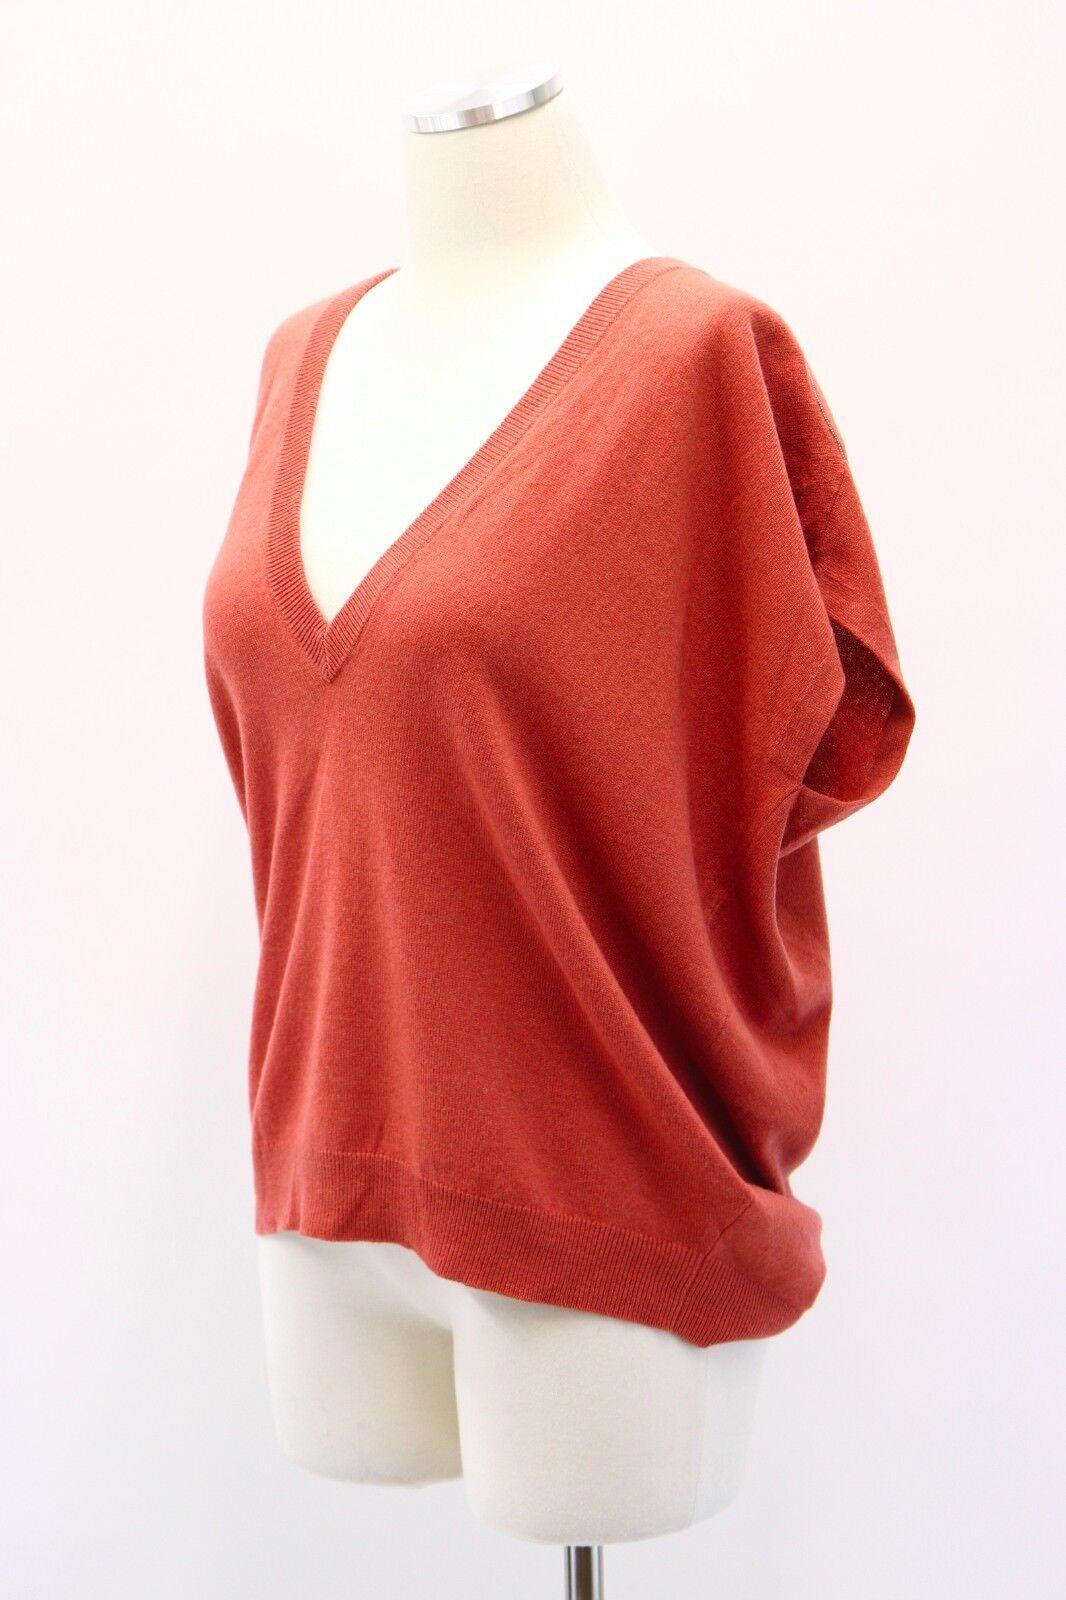 NWT  1425 Bspringaaello Cucinelli Cashmere -Silk -VWool Monili Bead tröja Vest M A181